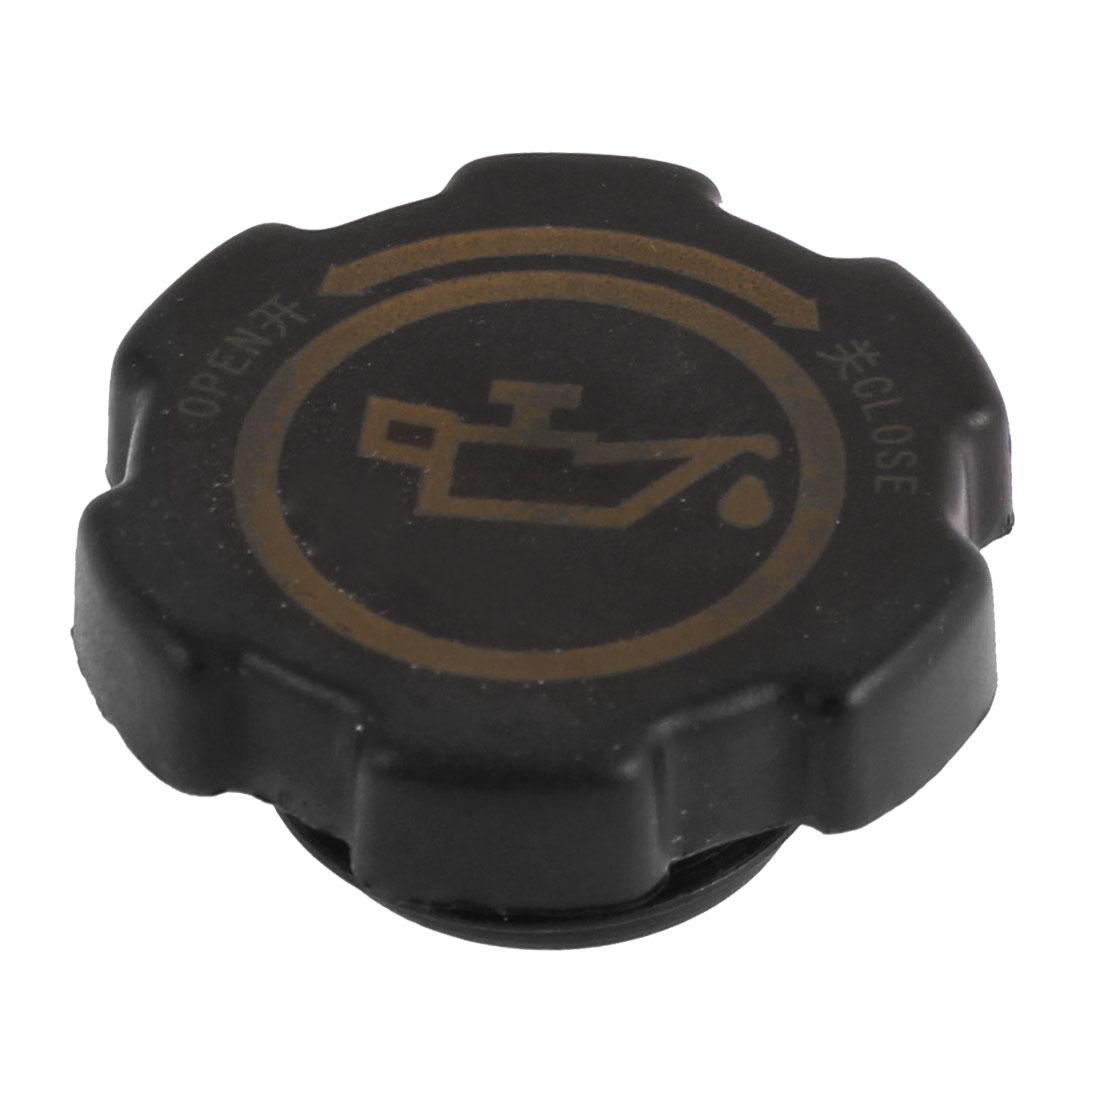 Car Engine Oil Filler Fuel Cap Cover Black 35mm Thread Dia